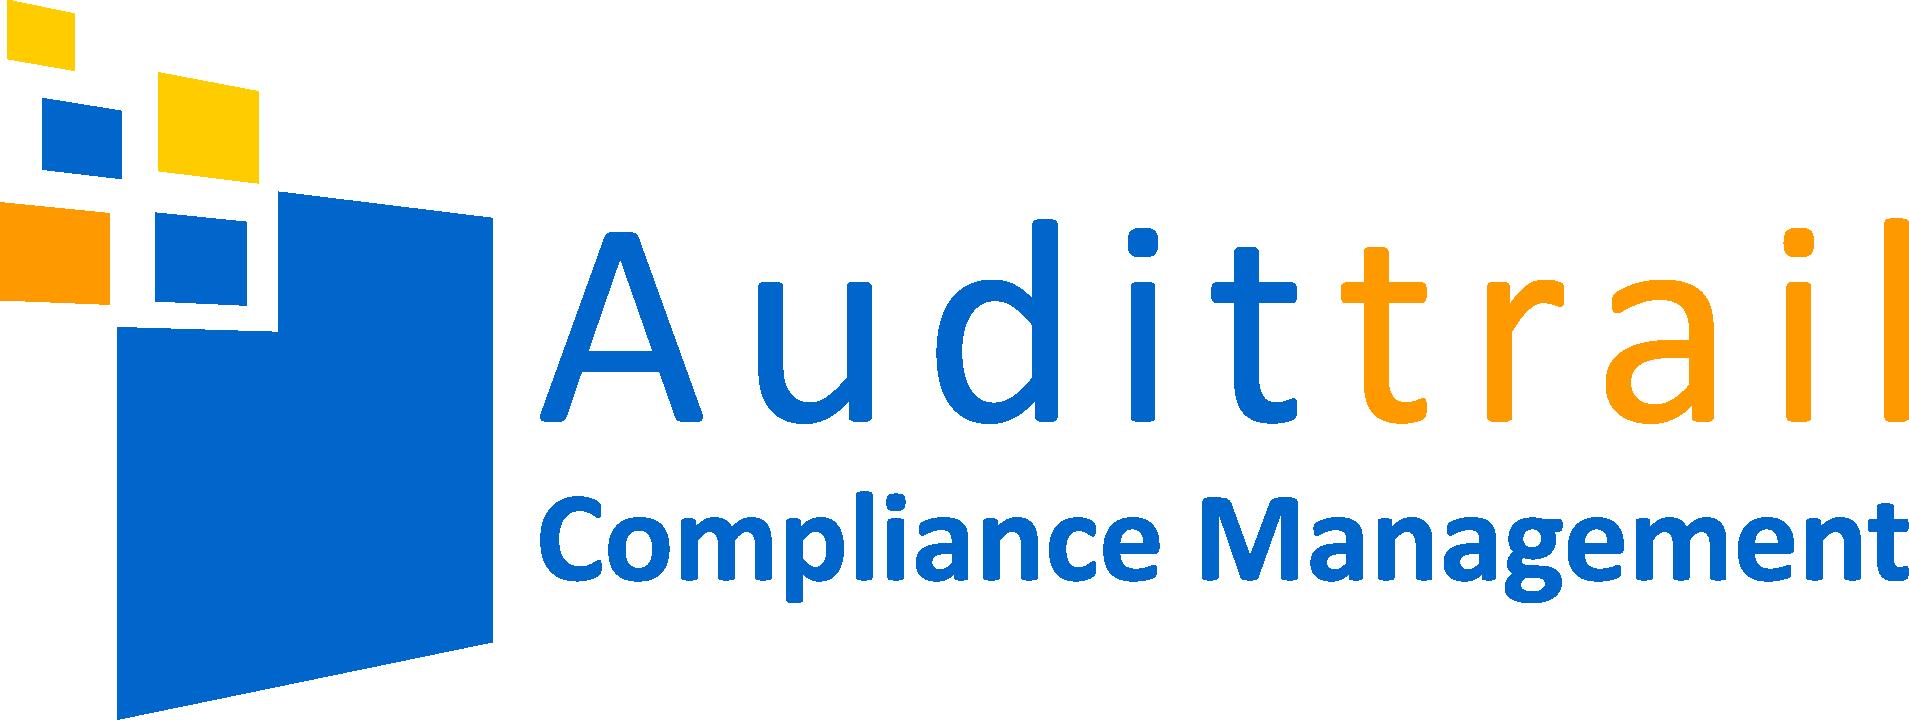 strategie consultancy Logo Audittrail